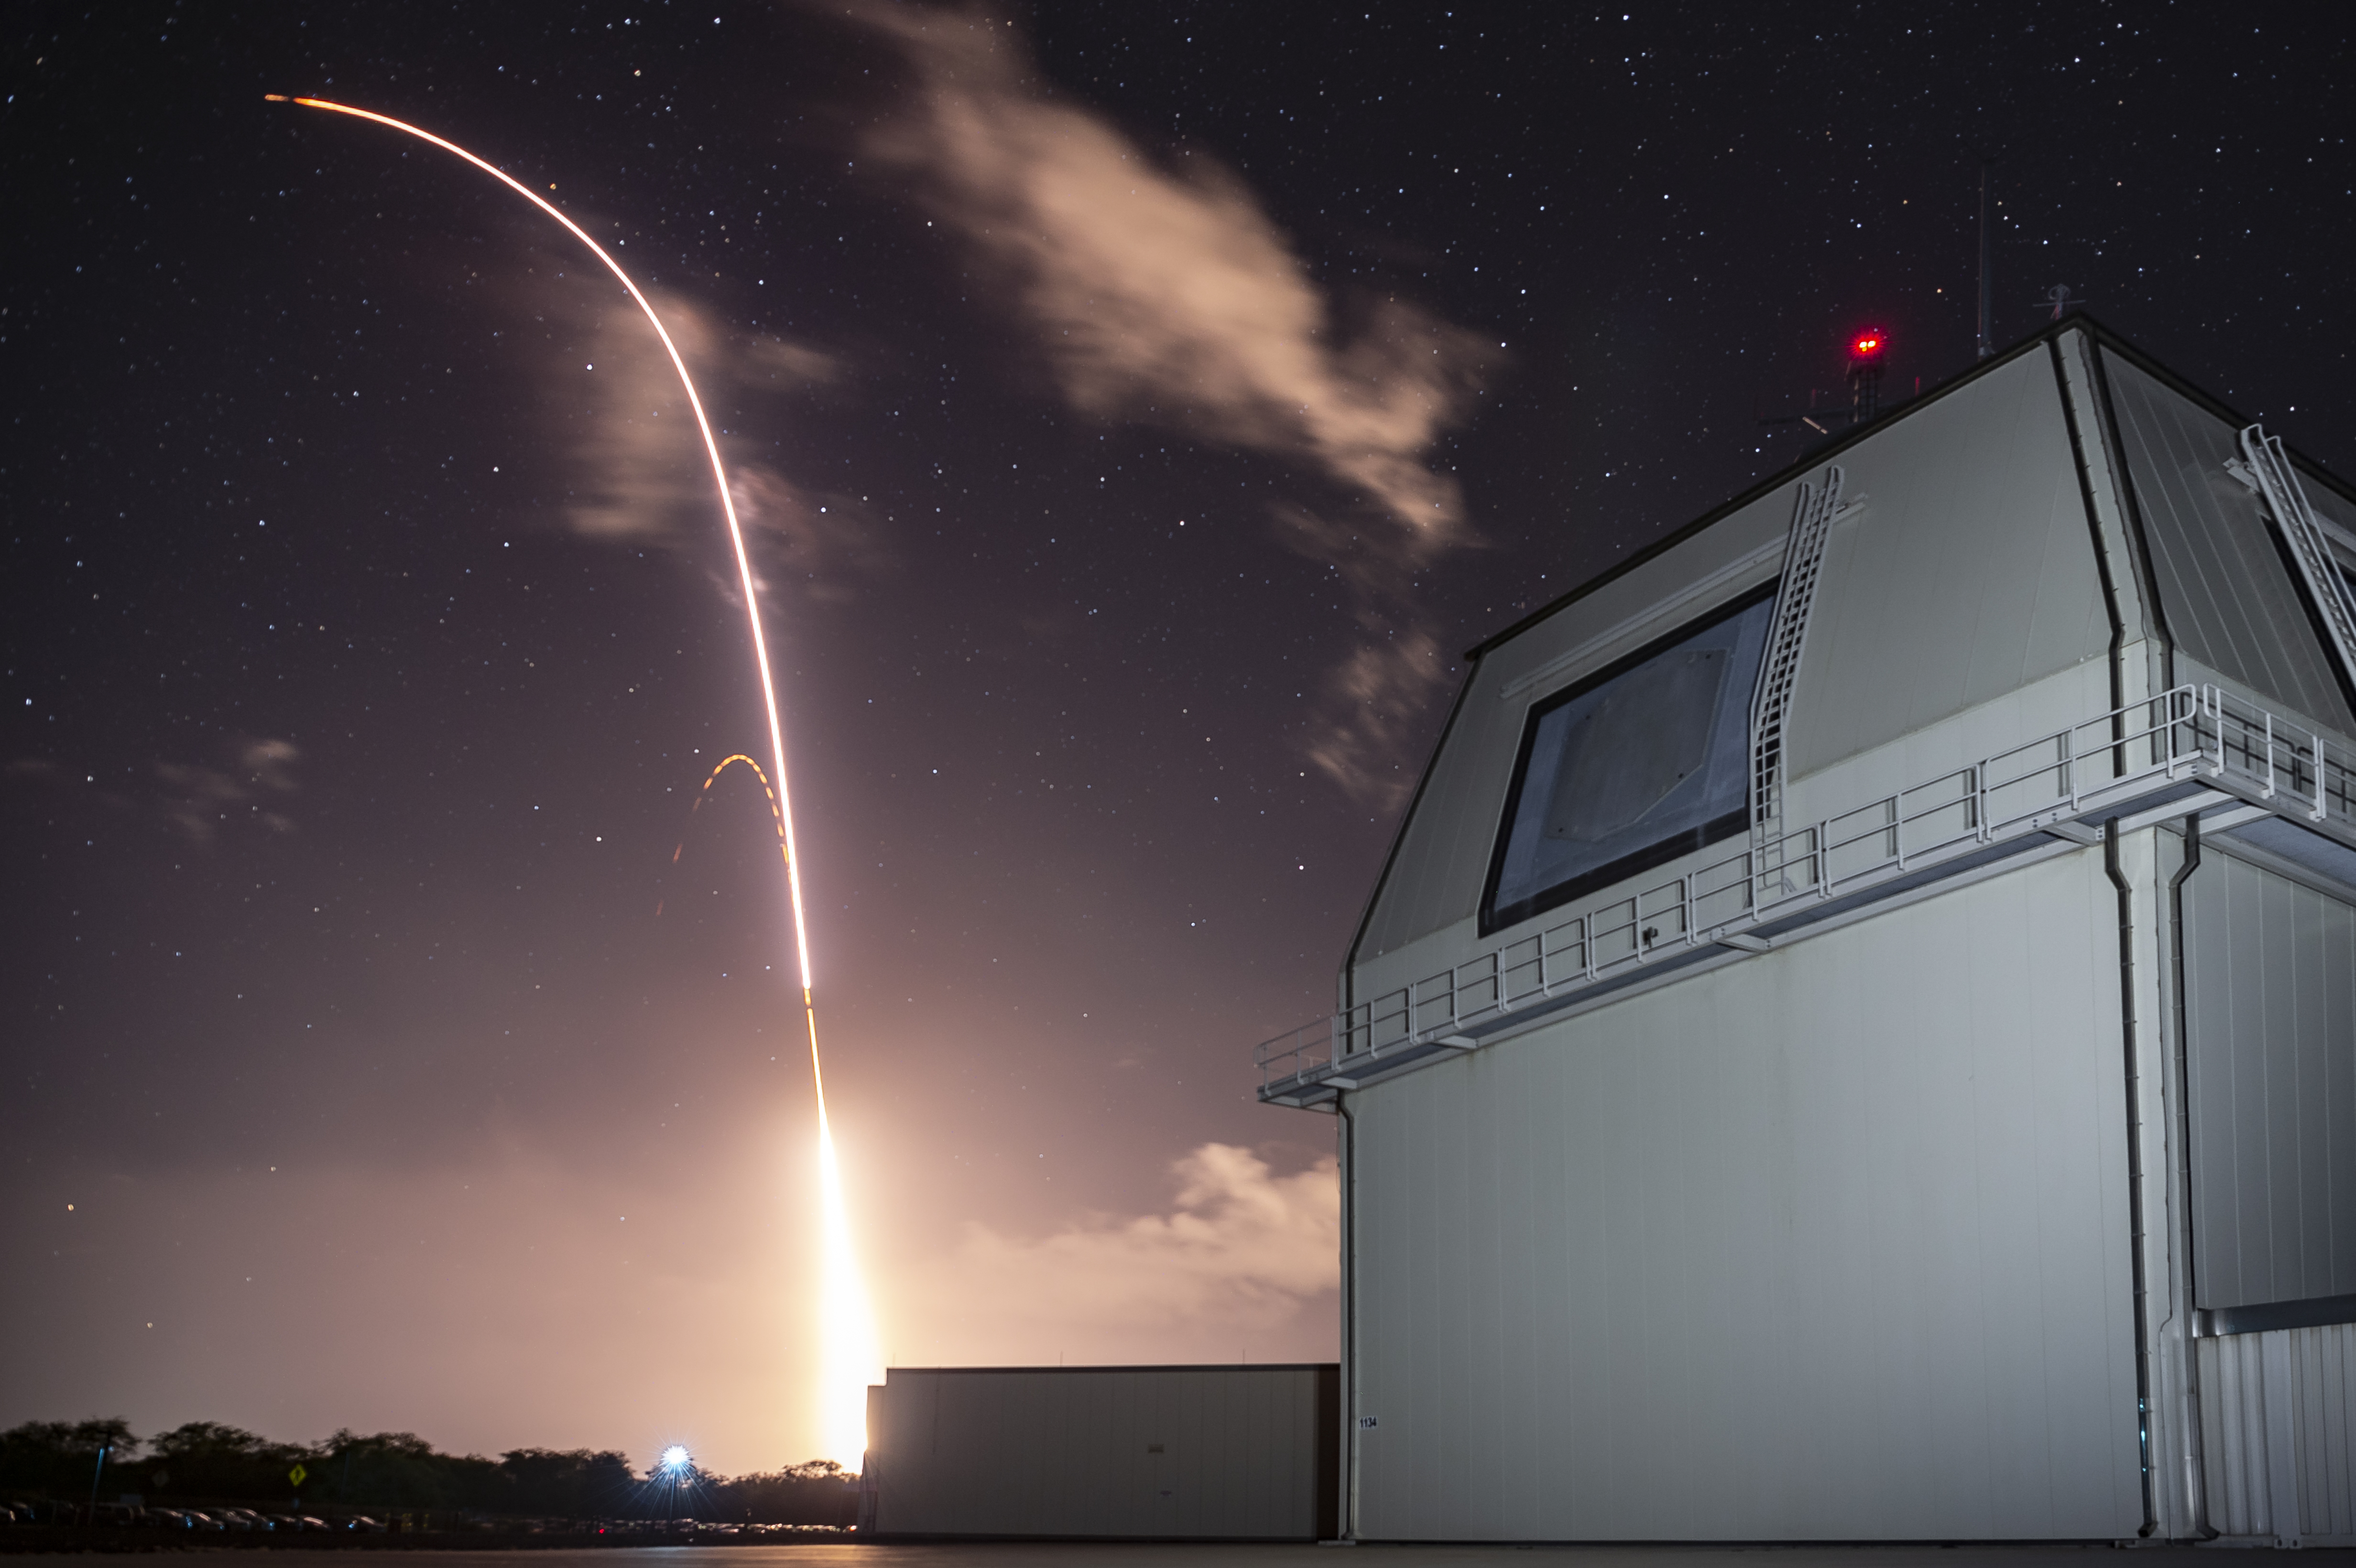 Raytheon Wins $257 Million Mod To Build 24 SM-3 IIAs